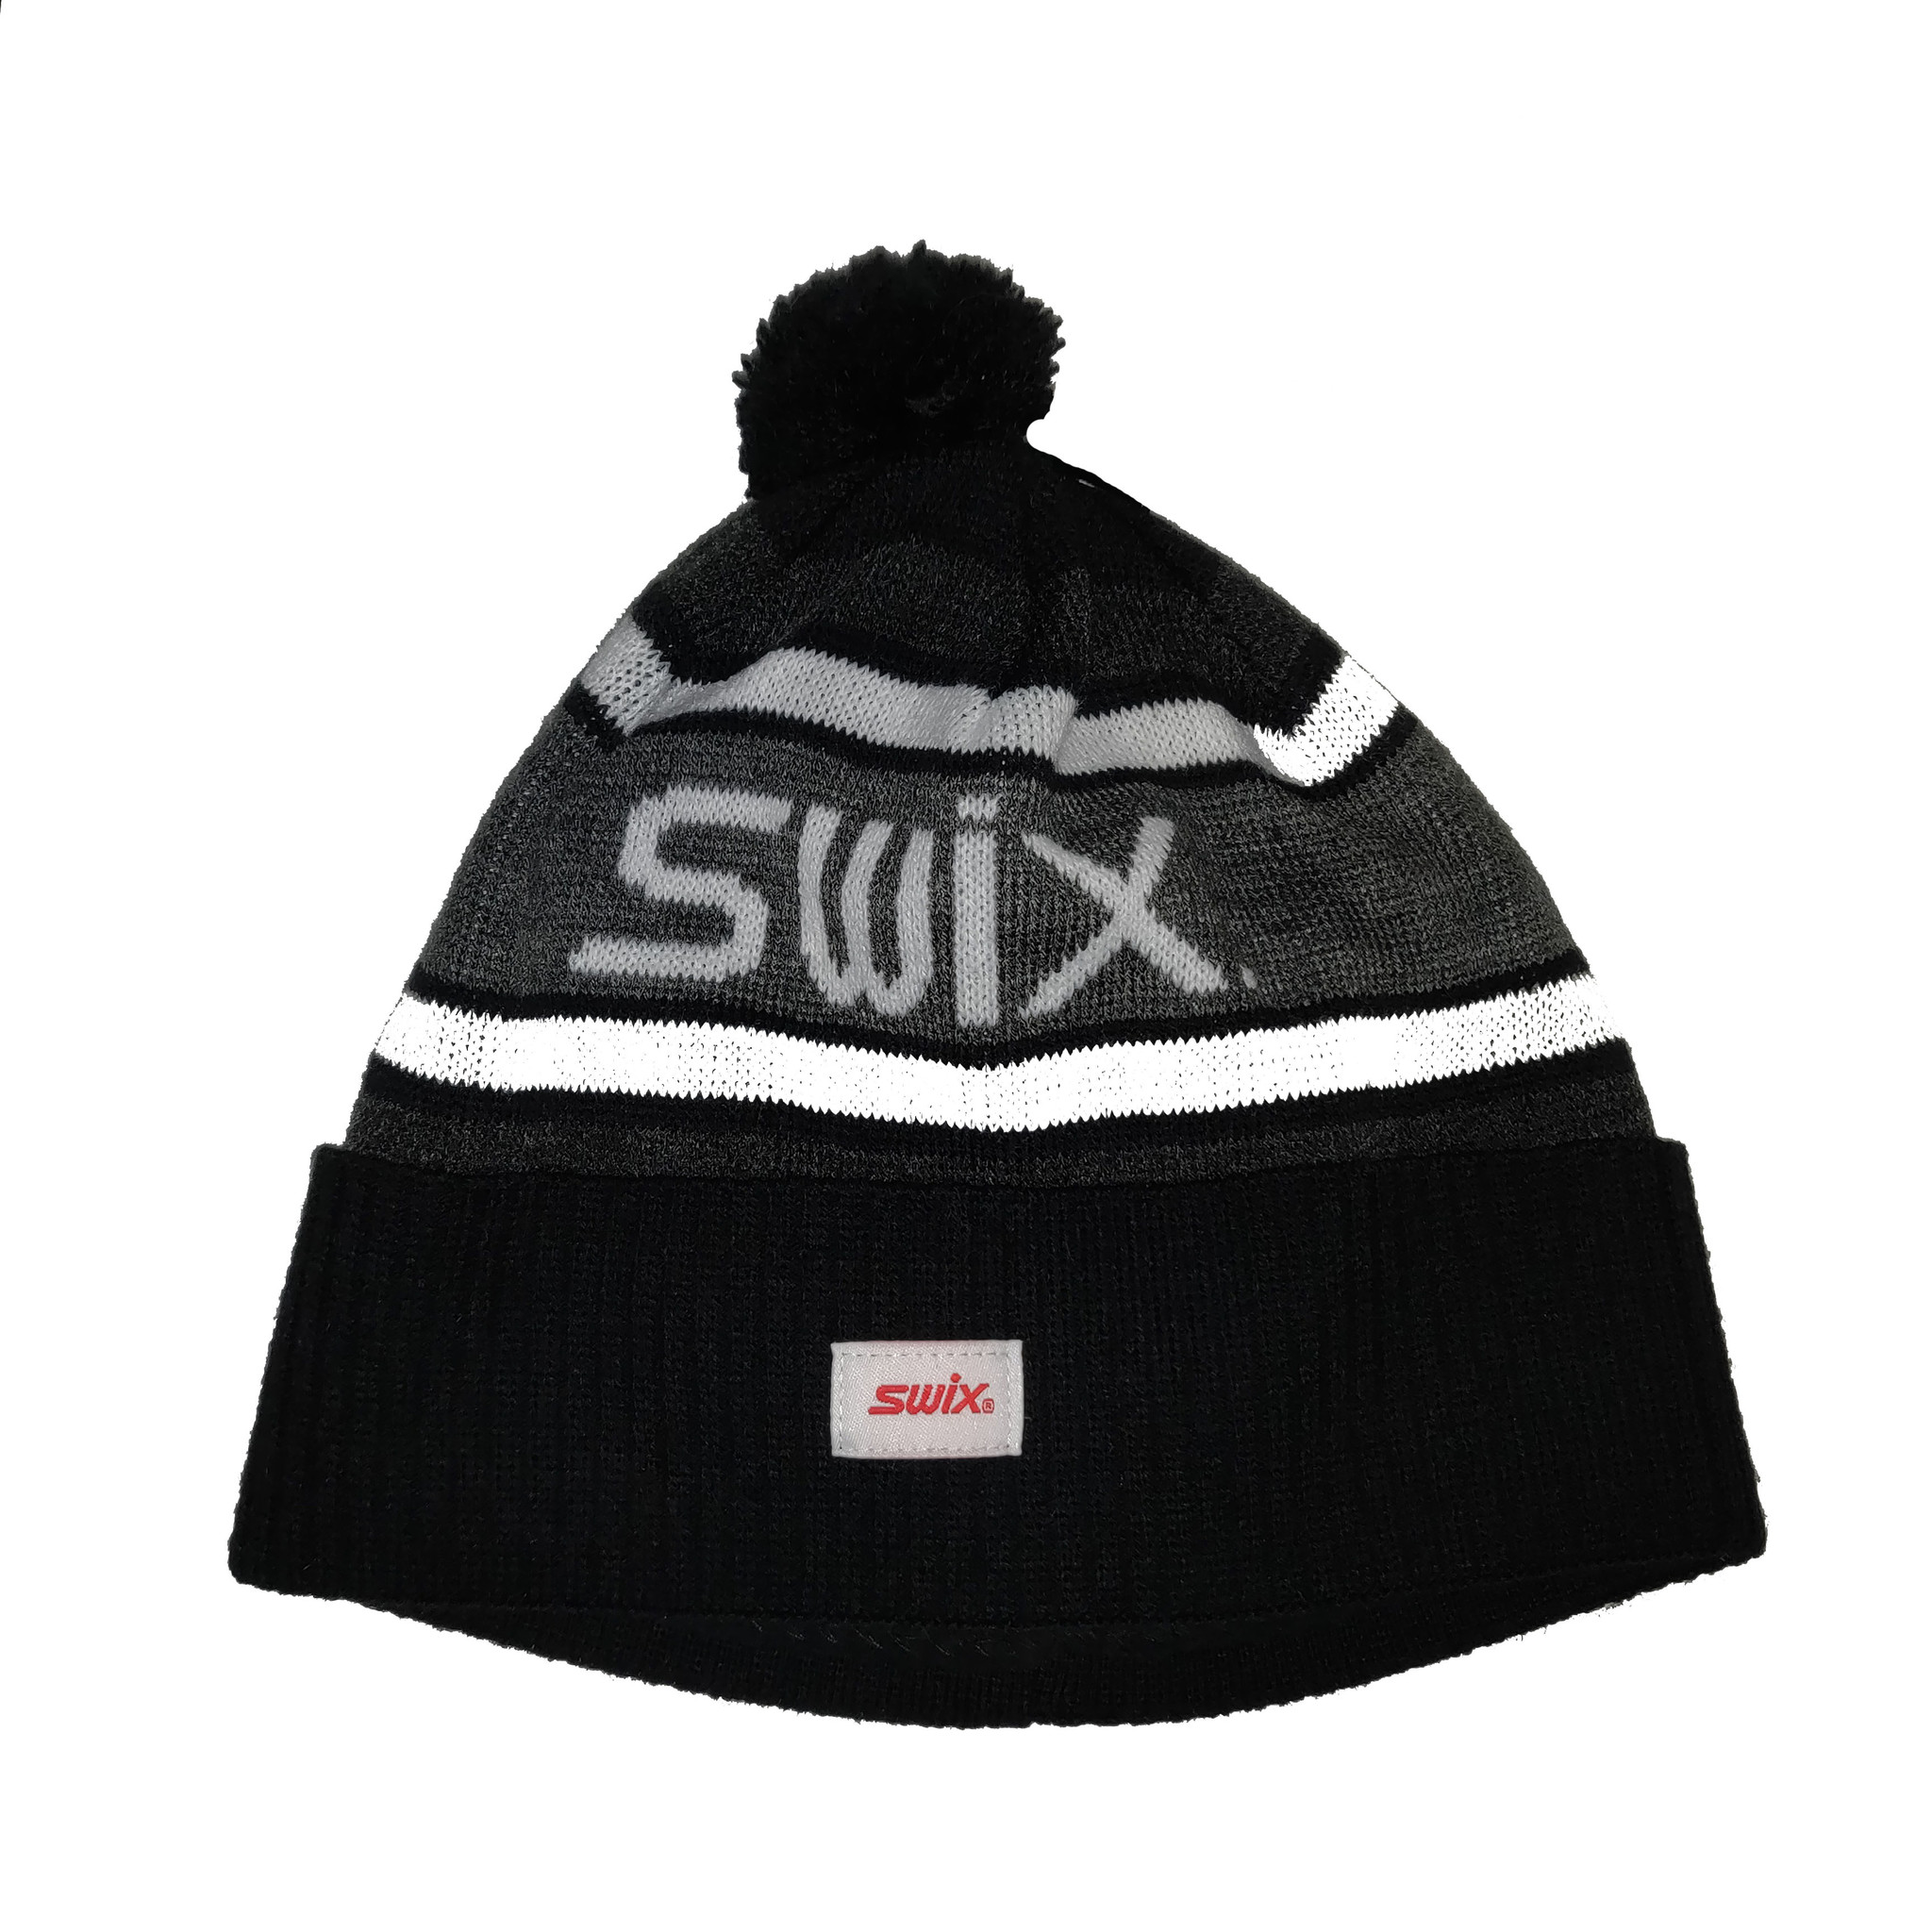 Swix Svein Hat Black